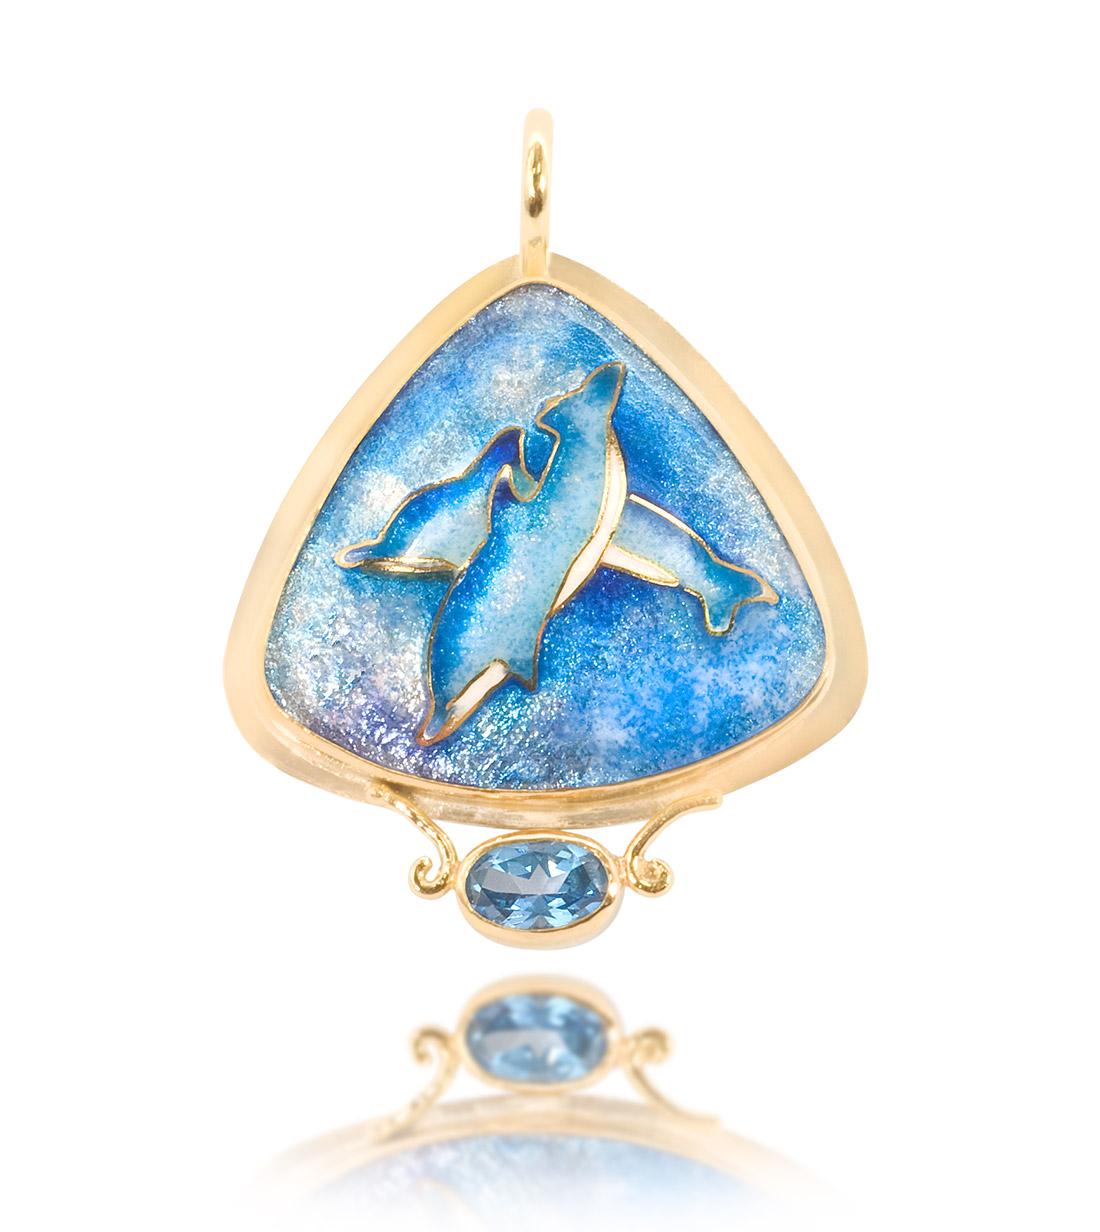 Dolphin | Cloisonne jewelry | Enamel jewelry | Unique jewelry designs